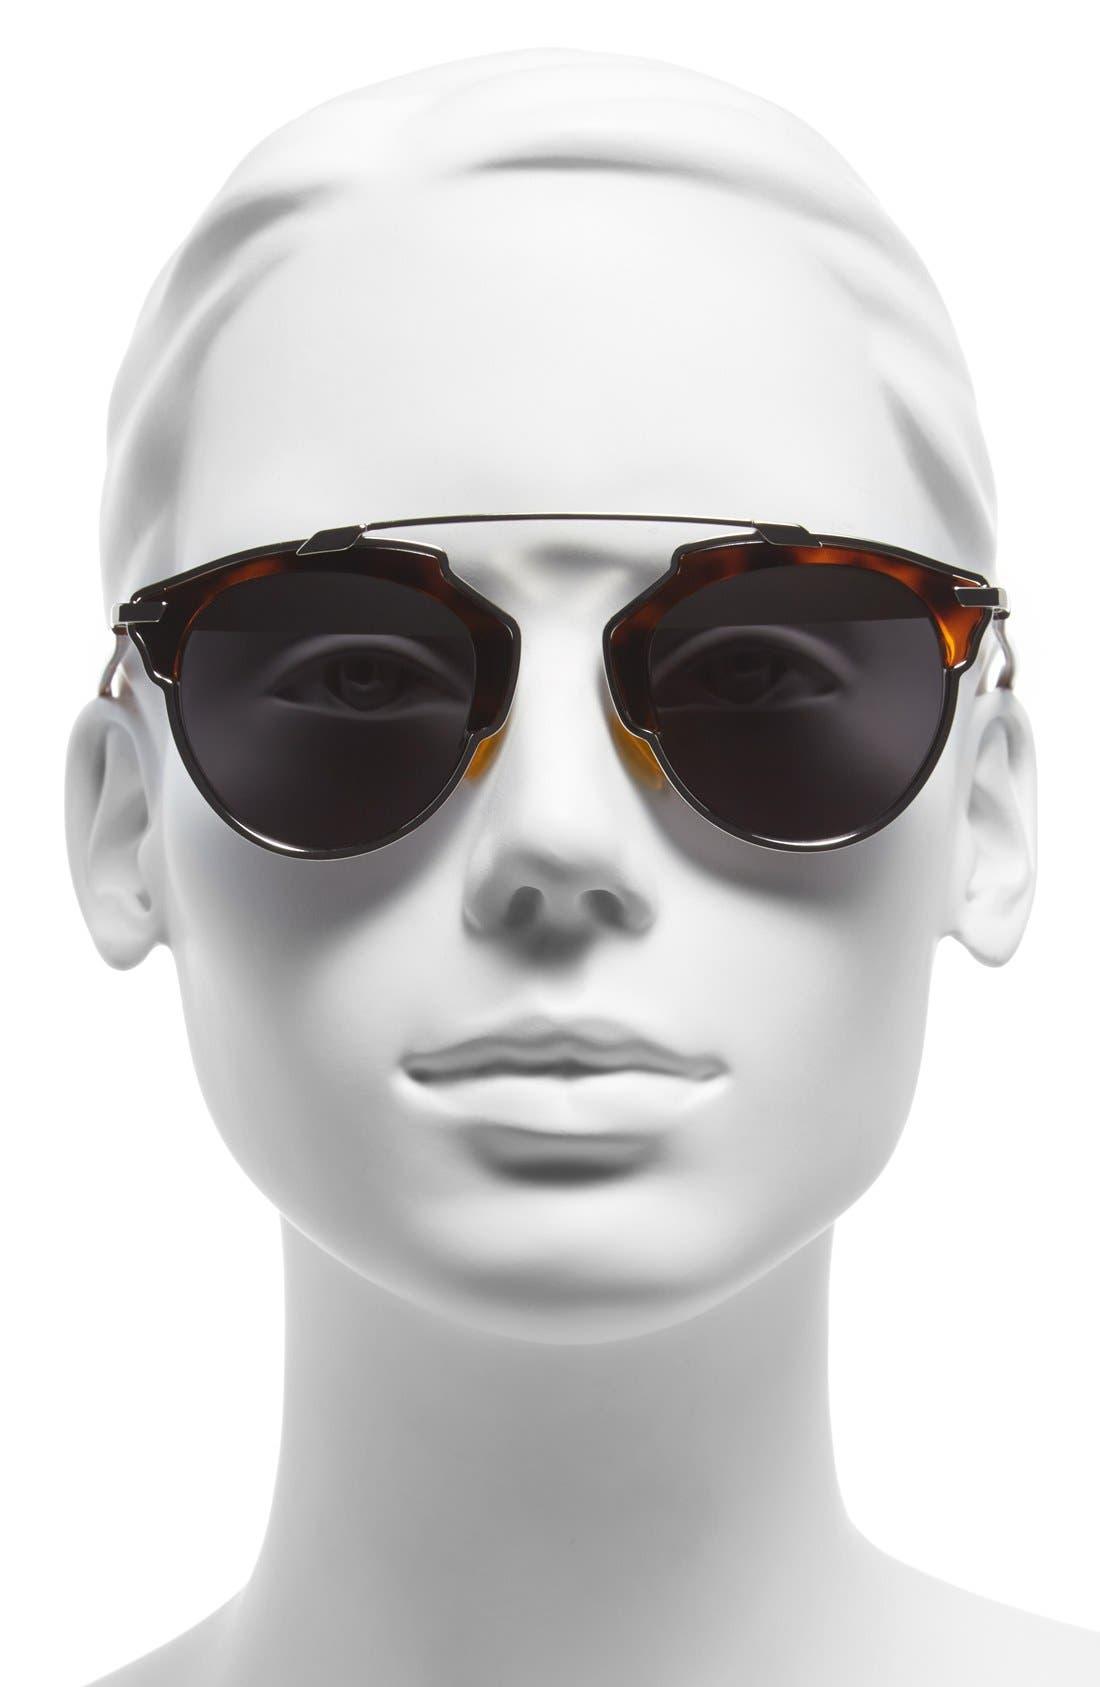 So Real 48mm Brow Bar Sunglasses,                             Alternate thumbnail 35, color,